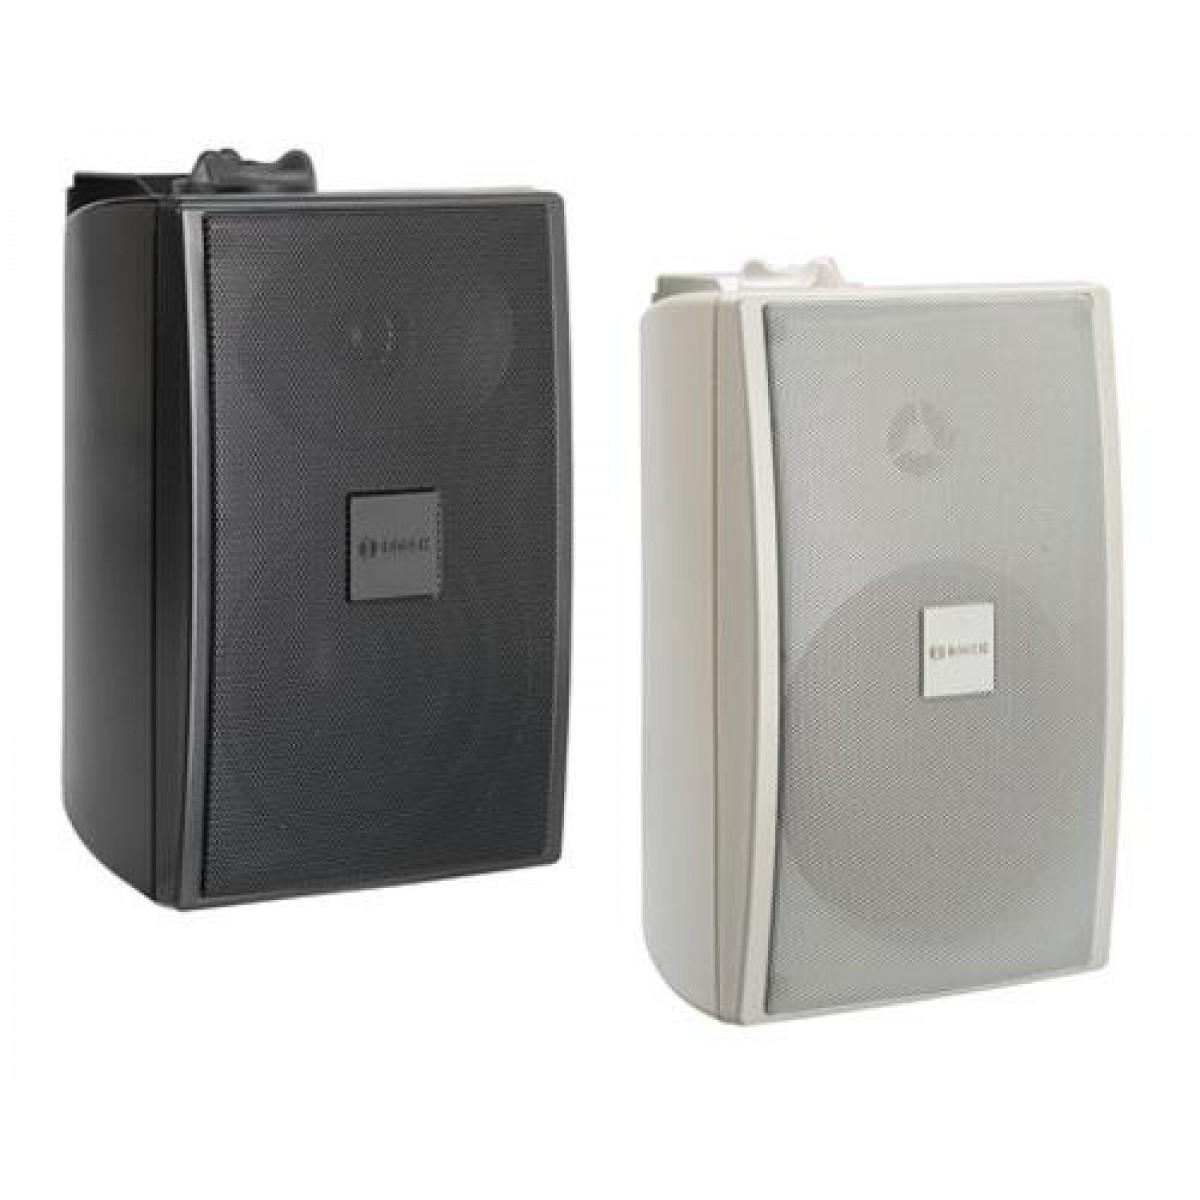 Bosch Lb2 Uc30 L D1 30w Ip65 Two Way Box Speaker Pacific Av